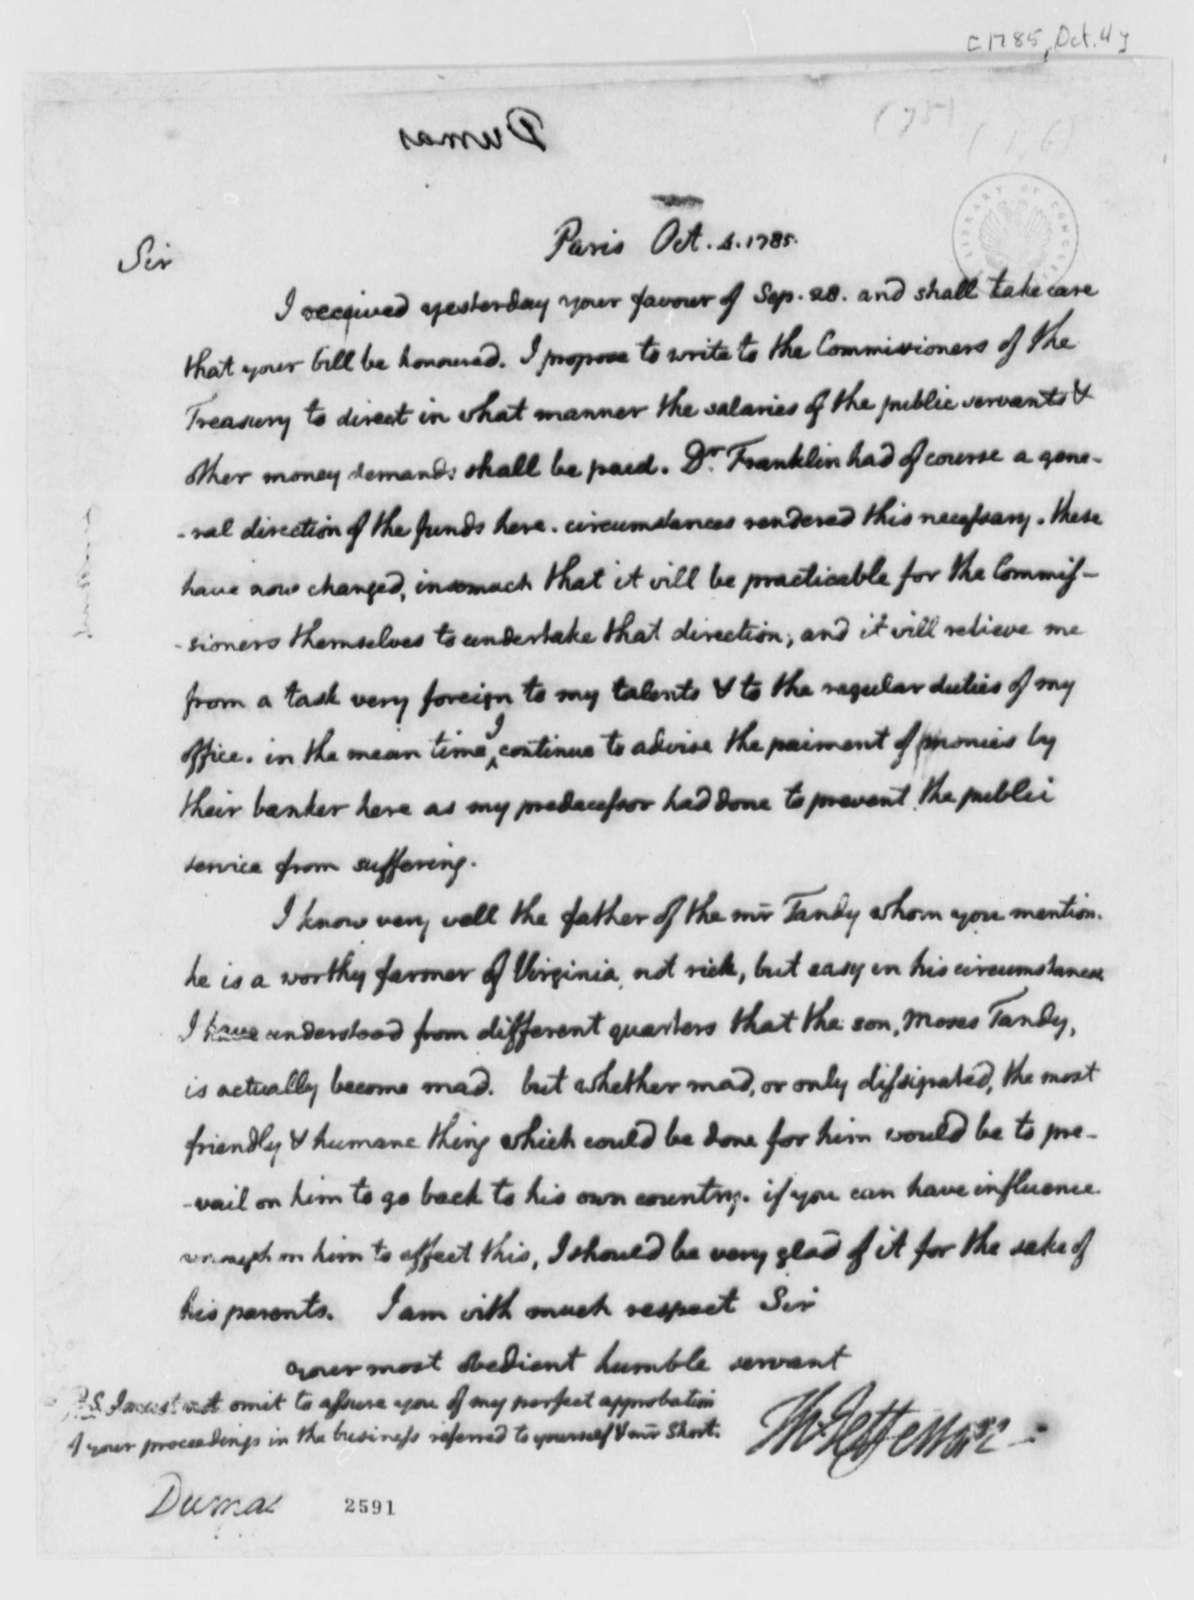 Thomas Jefferson to Charles William Frederic Dumas, October 4, 1785